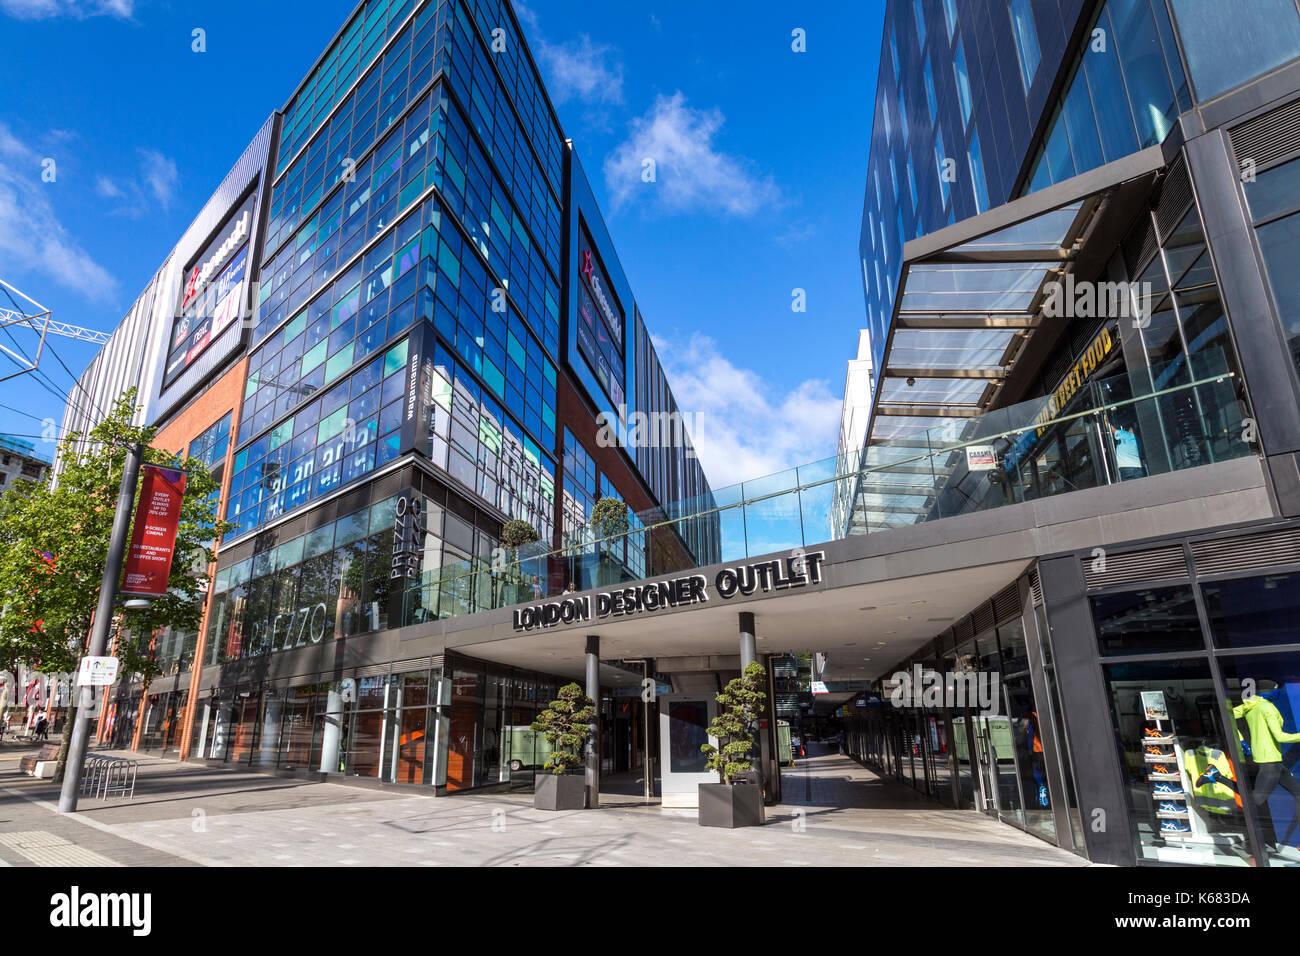 Contemporary Shopping Centre, London Designer Outlet, Wembley Park, London - Stock Image